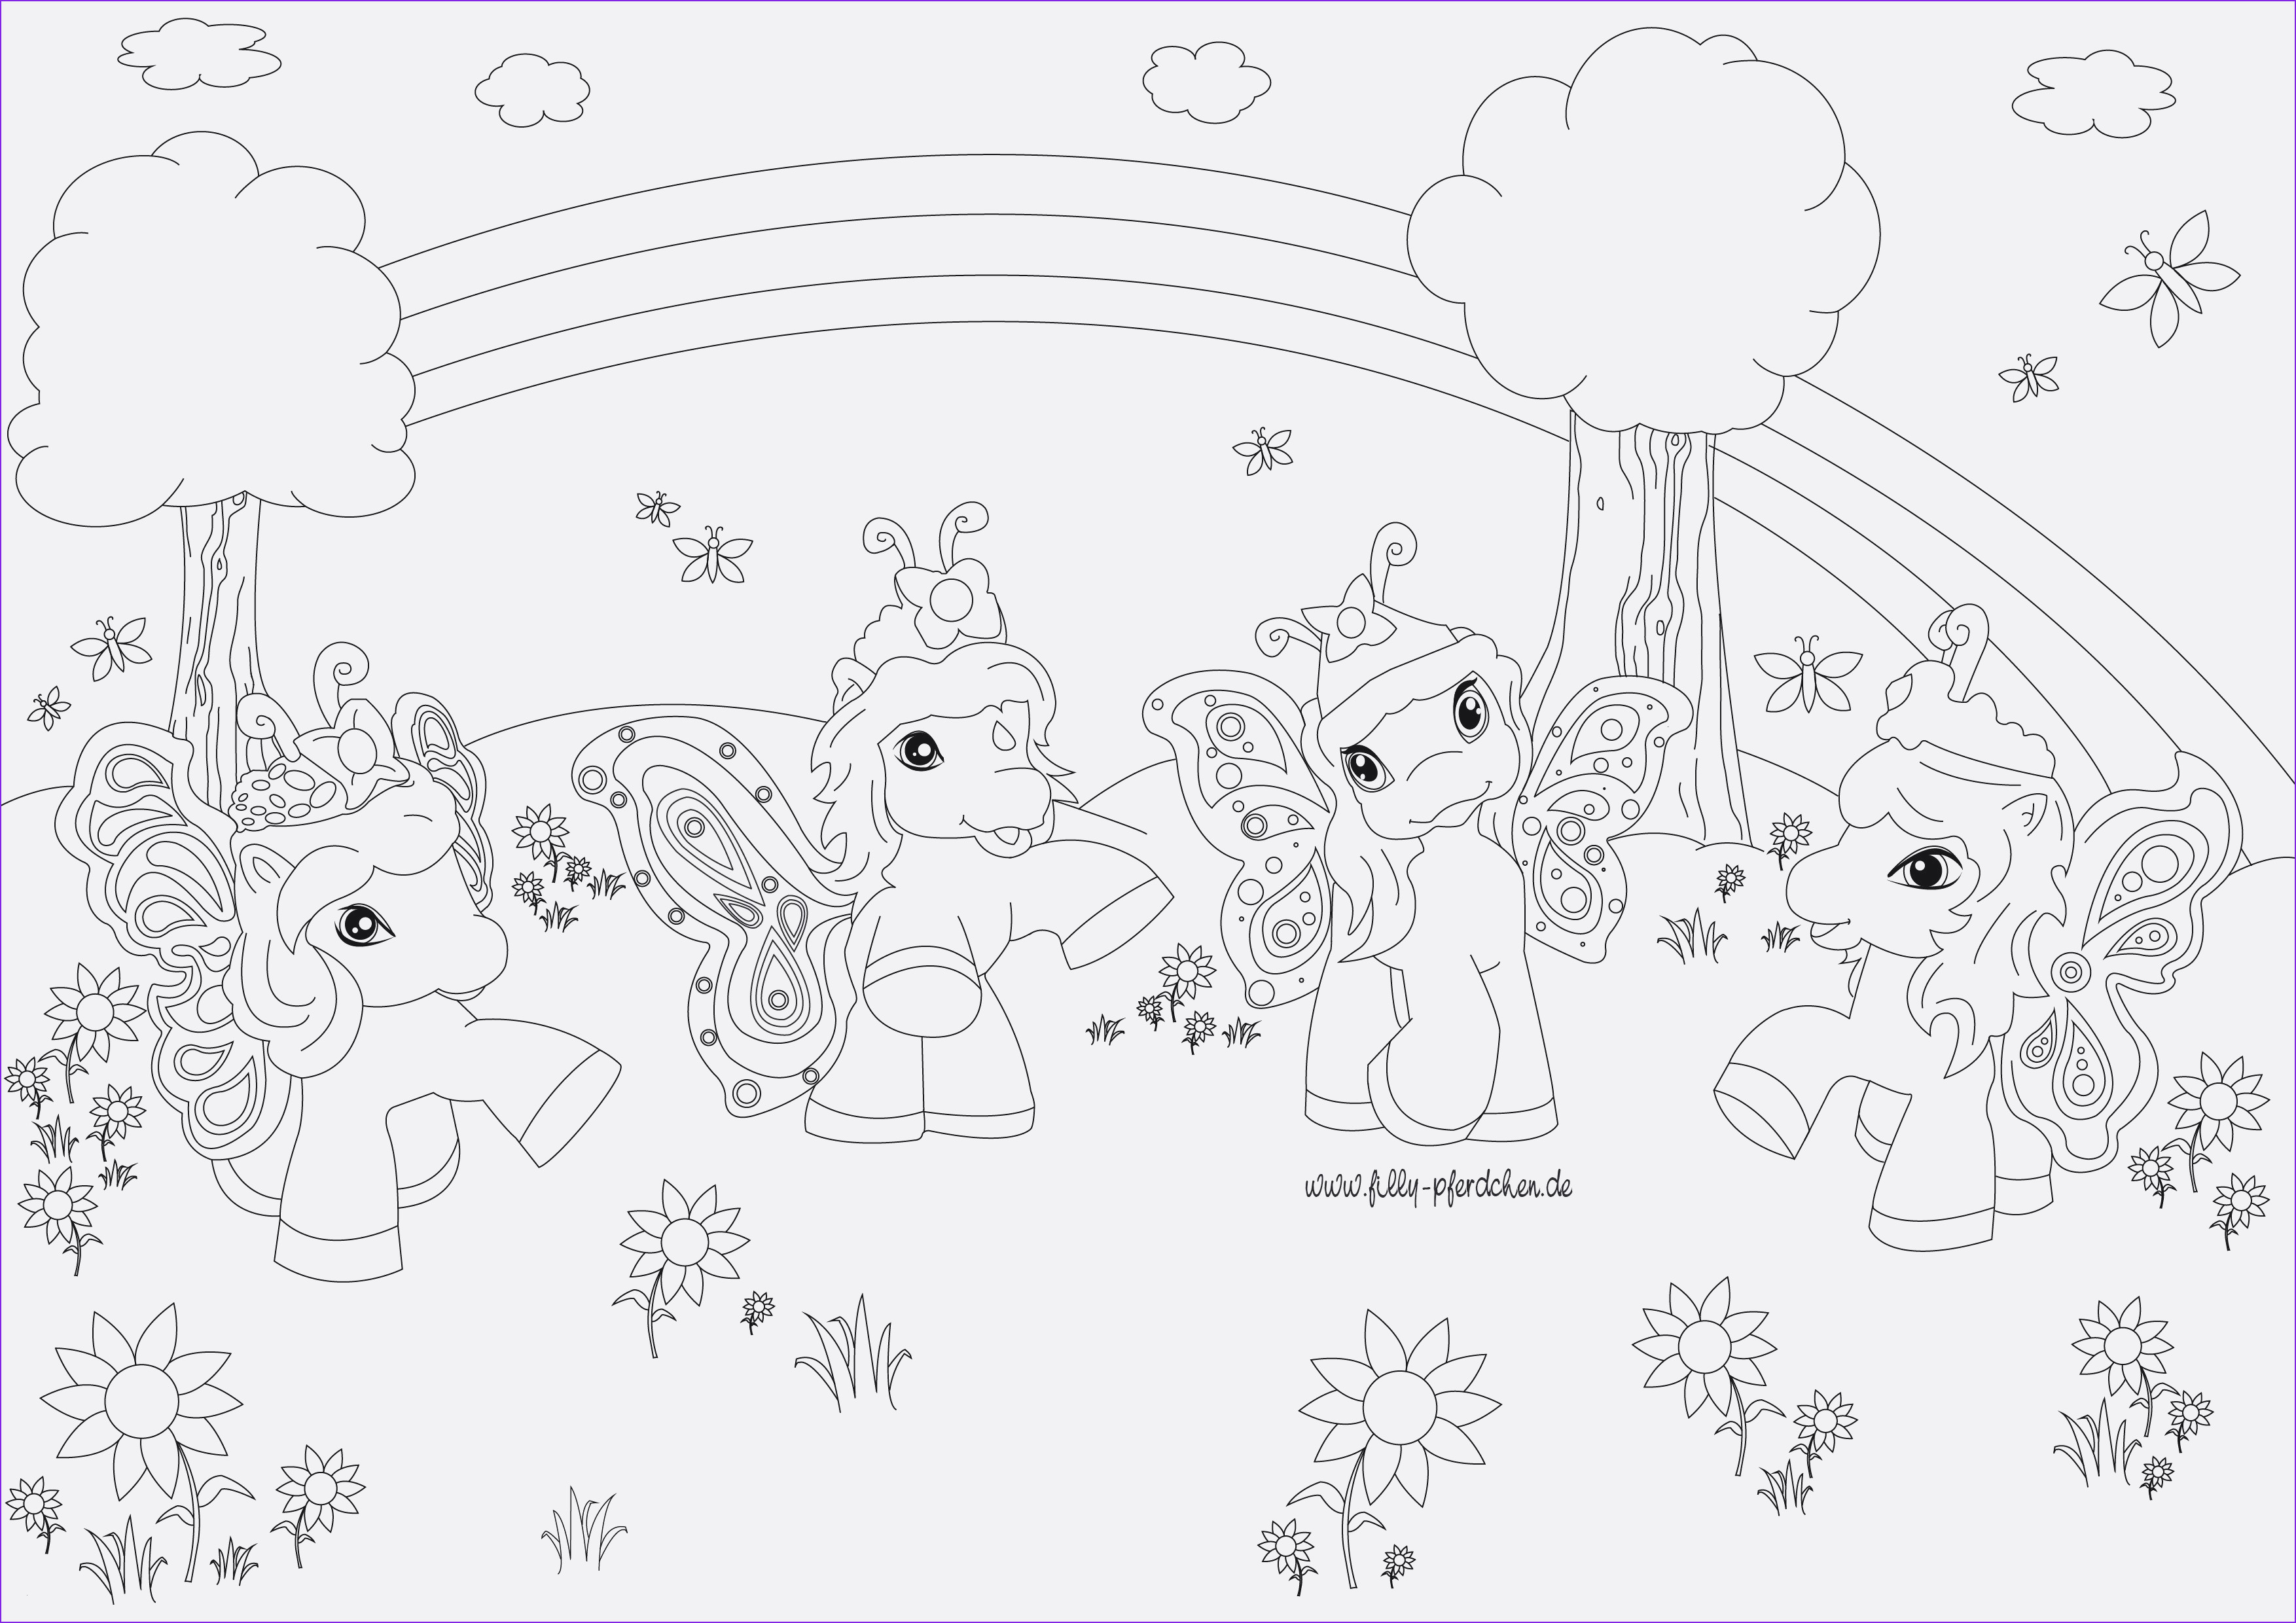 Hello Kitty Ausmalbild Inspirierend 40 Ausmalbilder Emoji Scoredatscore Elegant Hello Kitty Ausmalbilder Stock